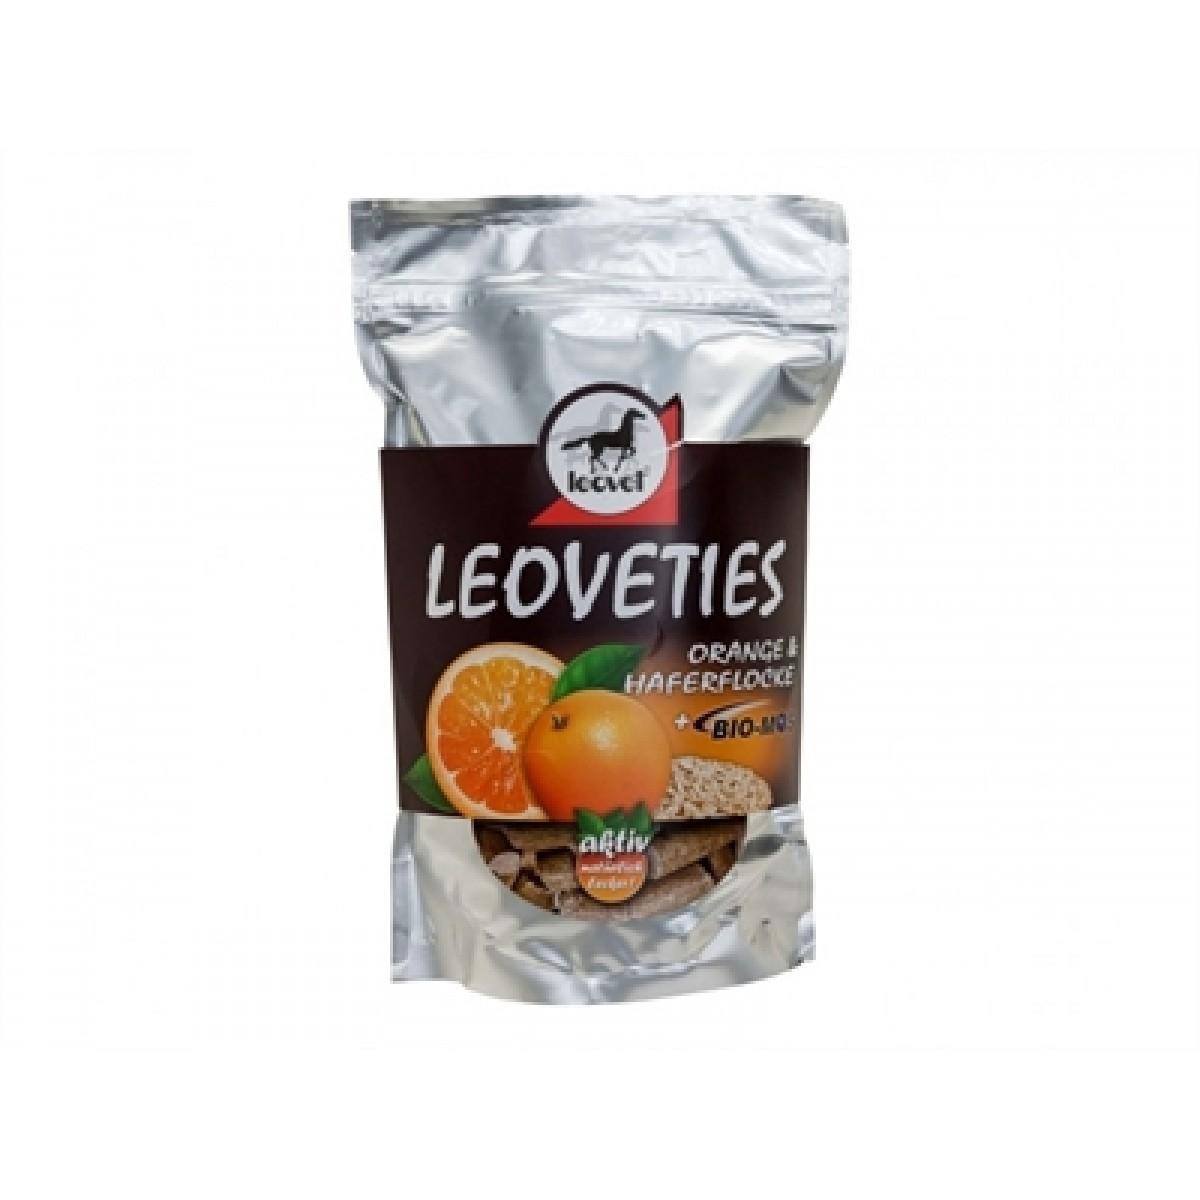 Leoveties Appelsin - Havregryn